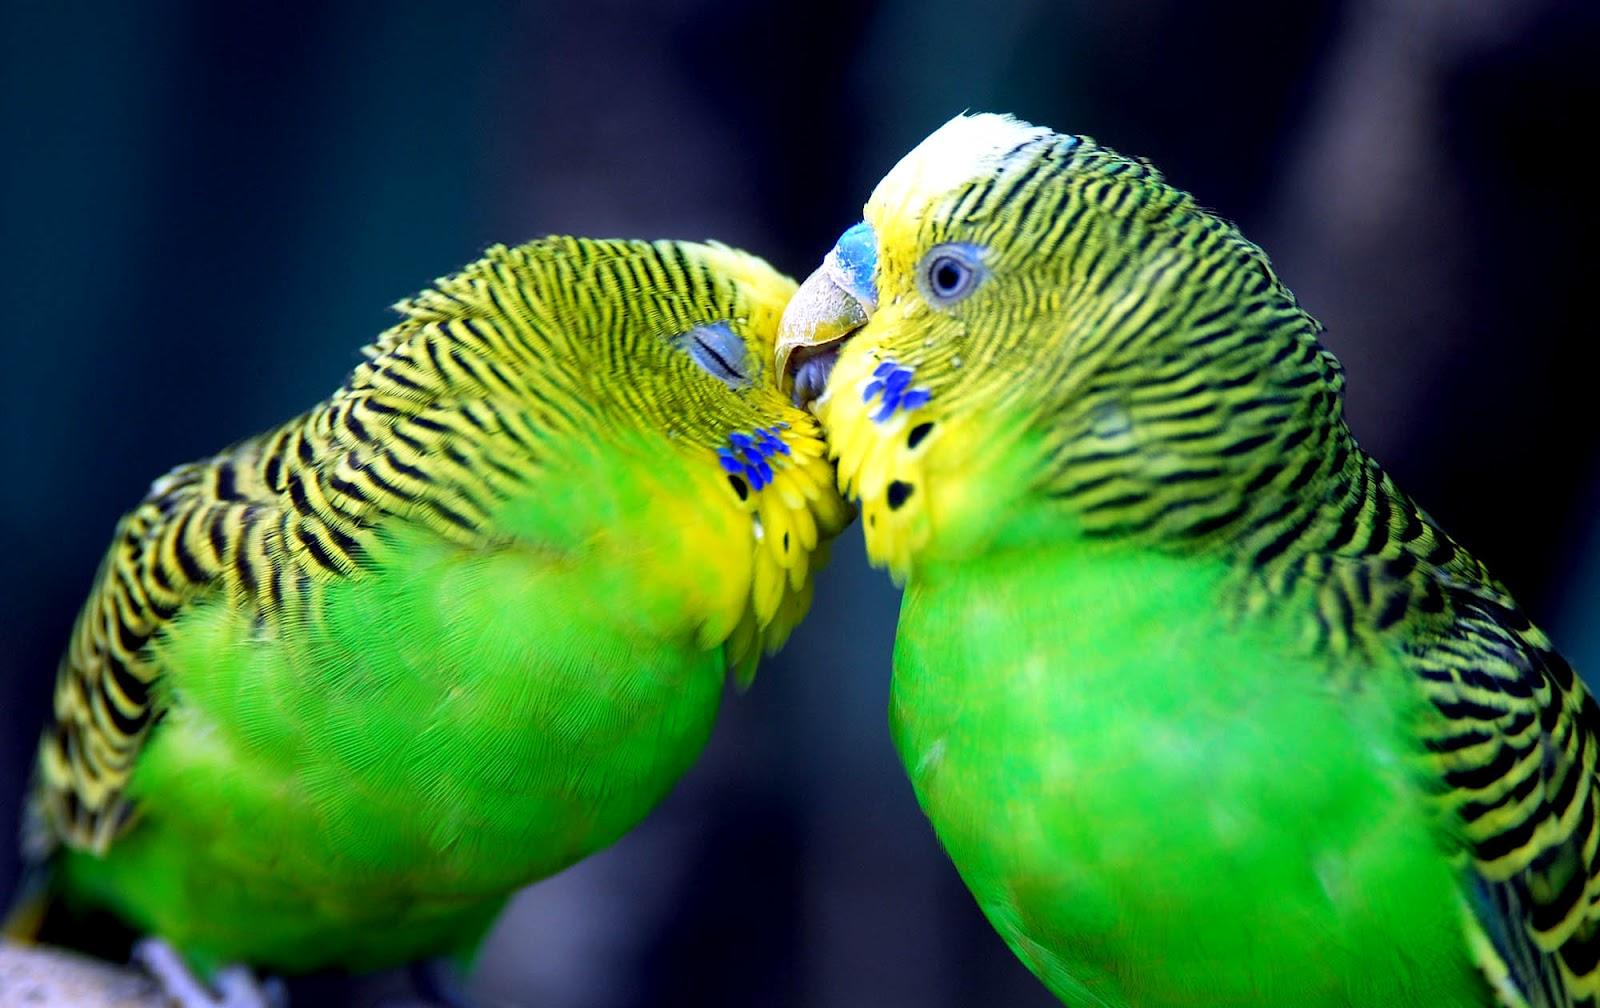 Wallpaper Gallery Love Bird Wallpaper: Best Pics Store: Top 20 Cute Birds HD Wallpapers For Pc